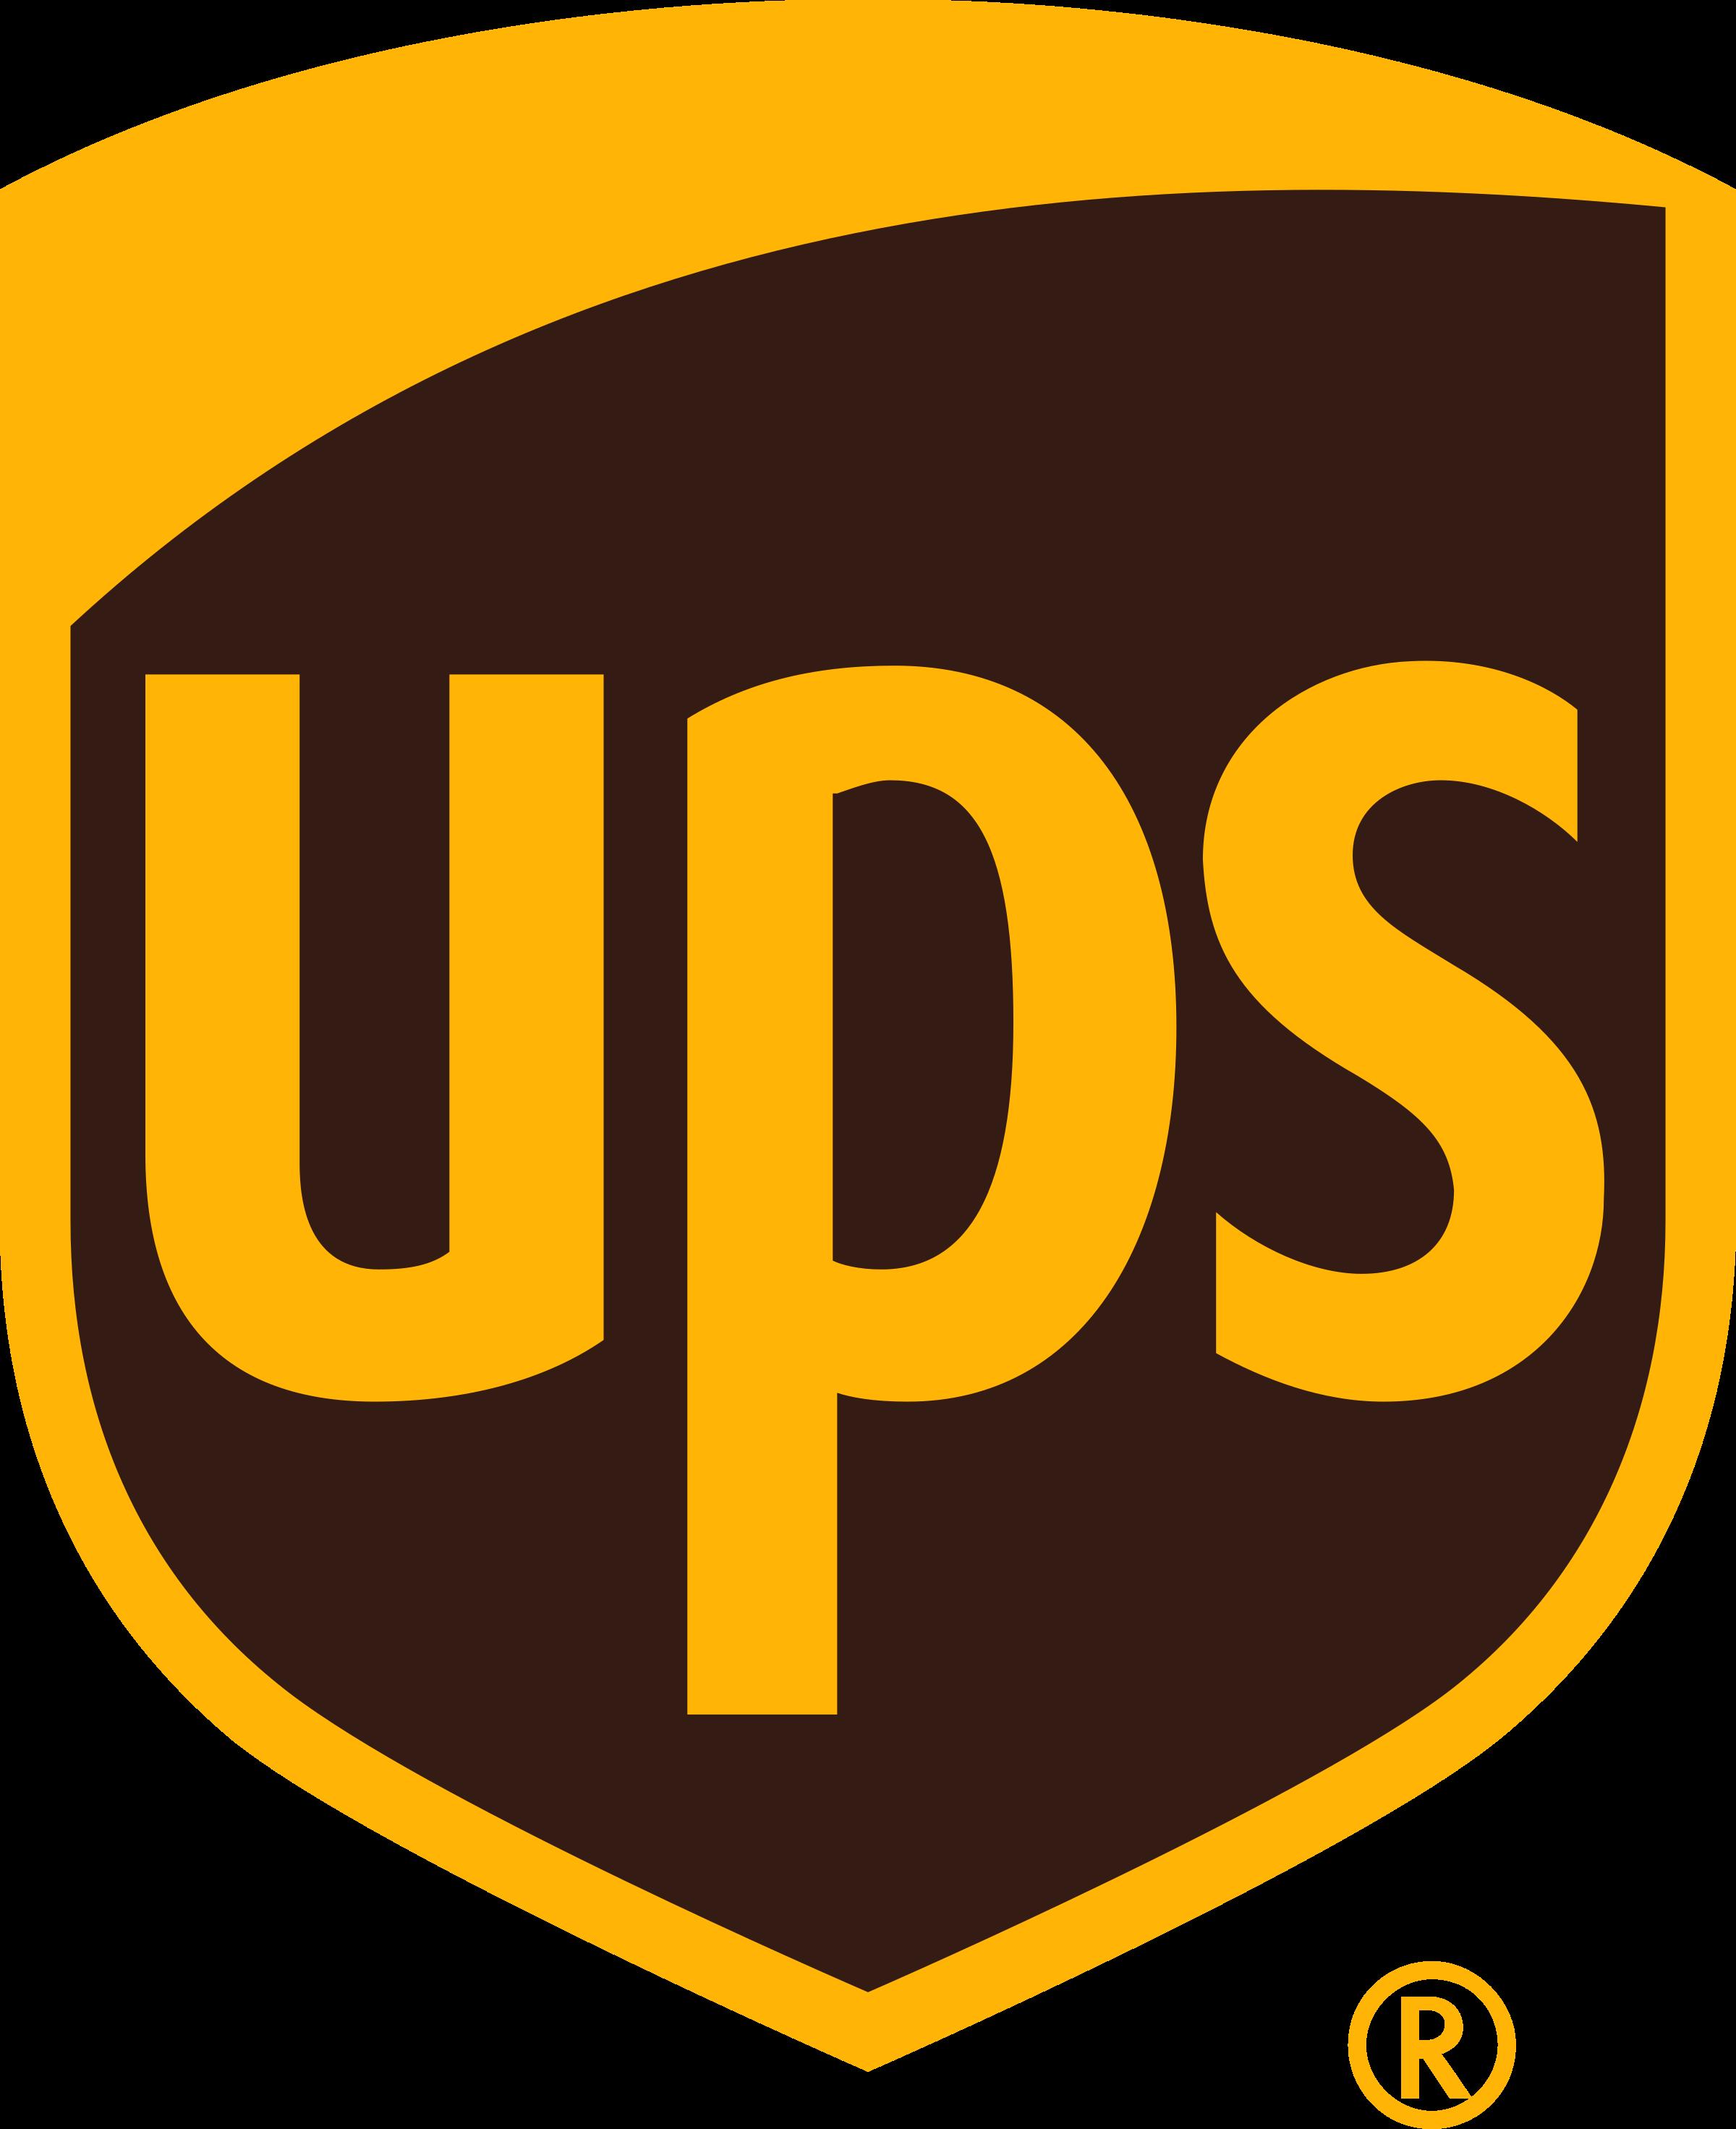 ups logo png transparent svg vector freebie supply rh freebiesupply com usps logo vector usps logo vector